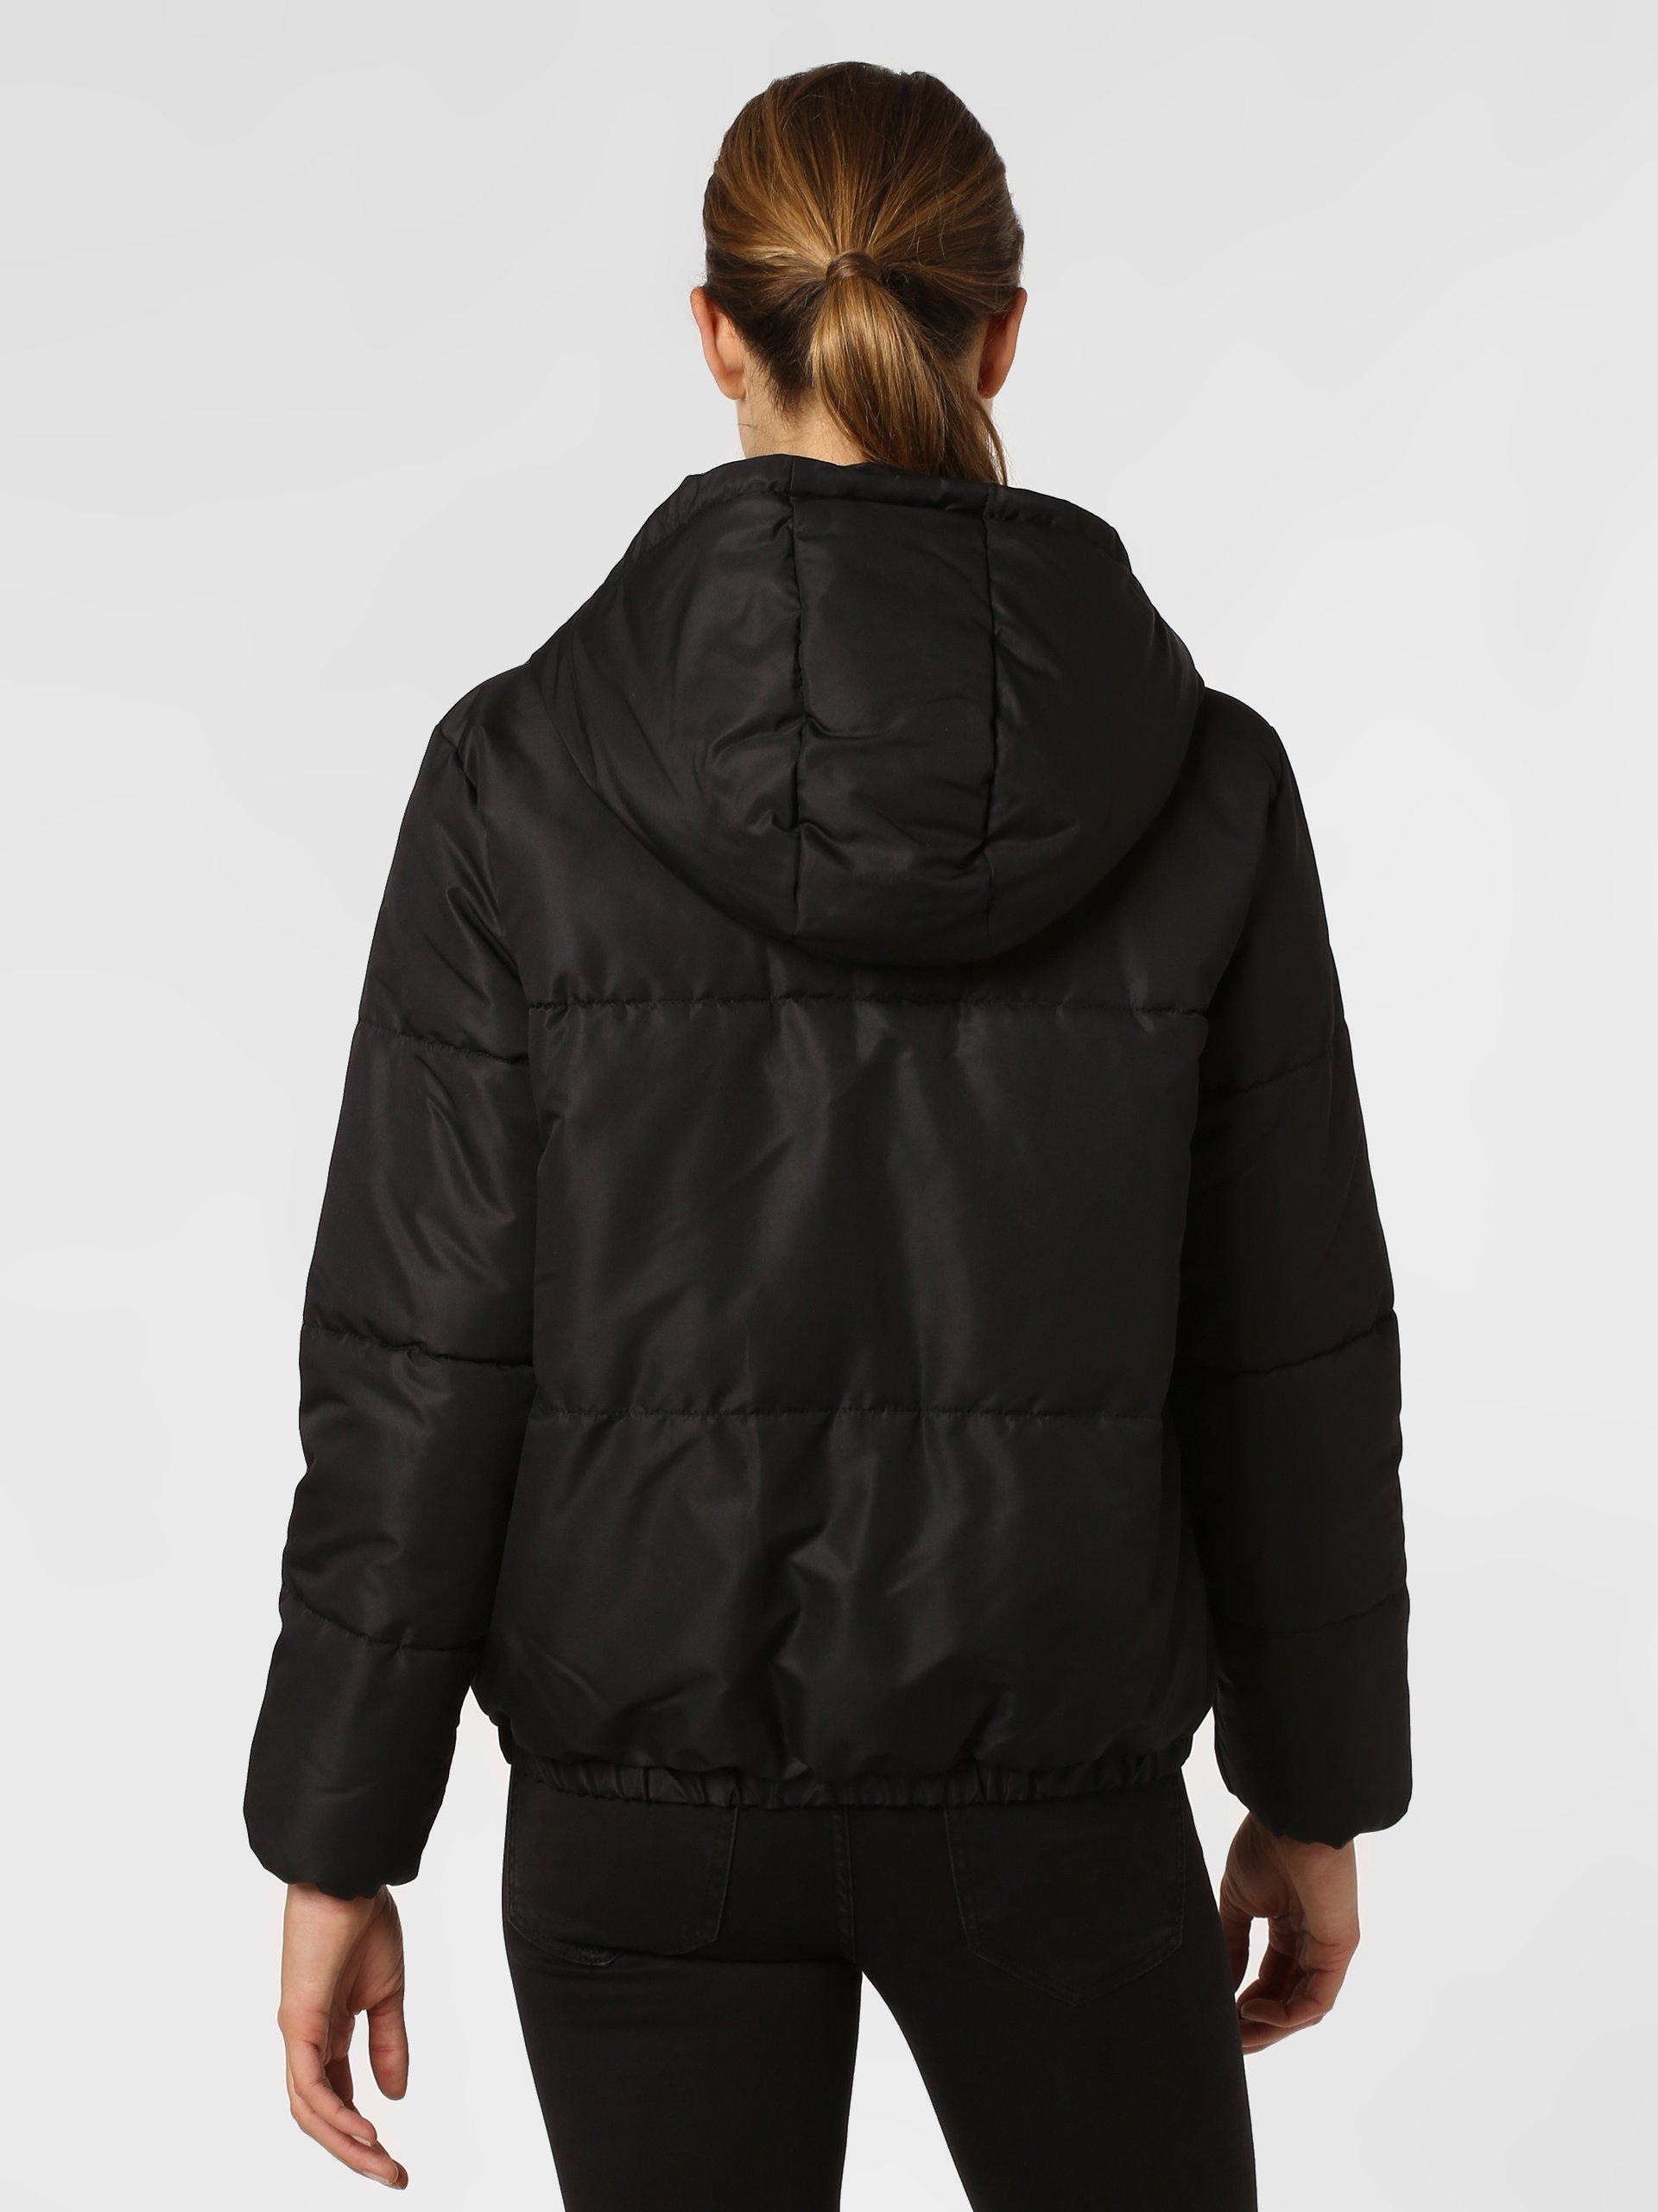 Review Damen Jacke